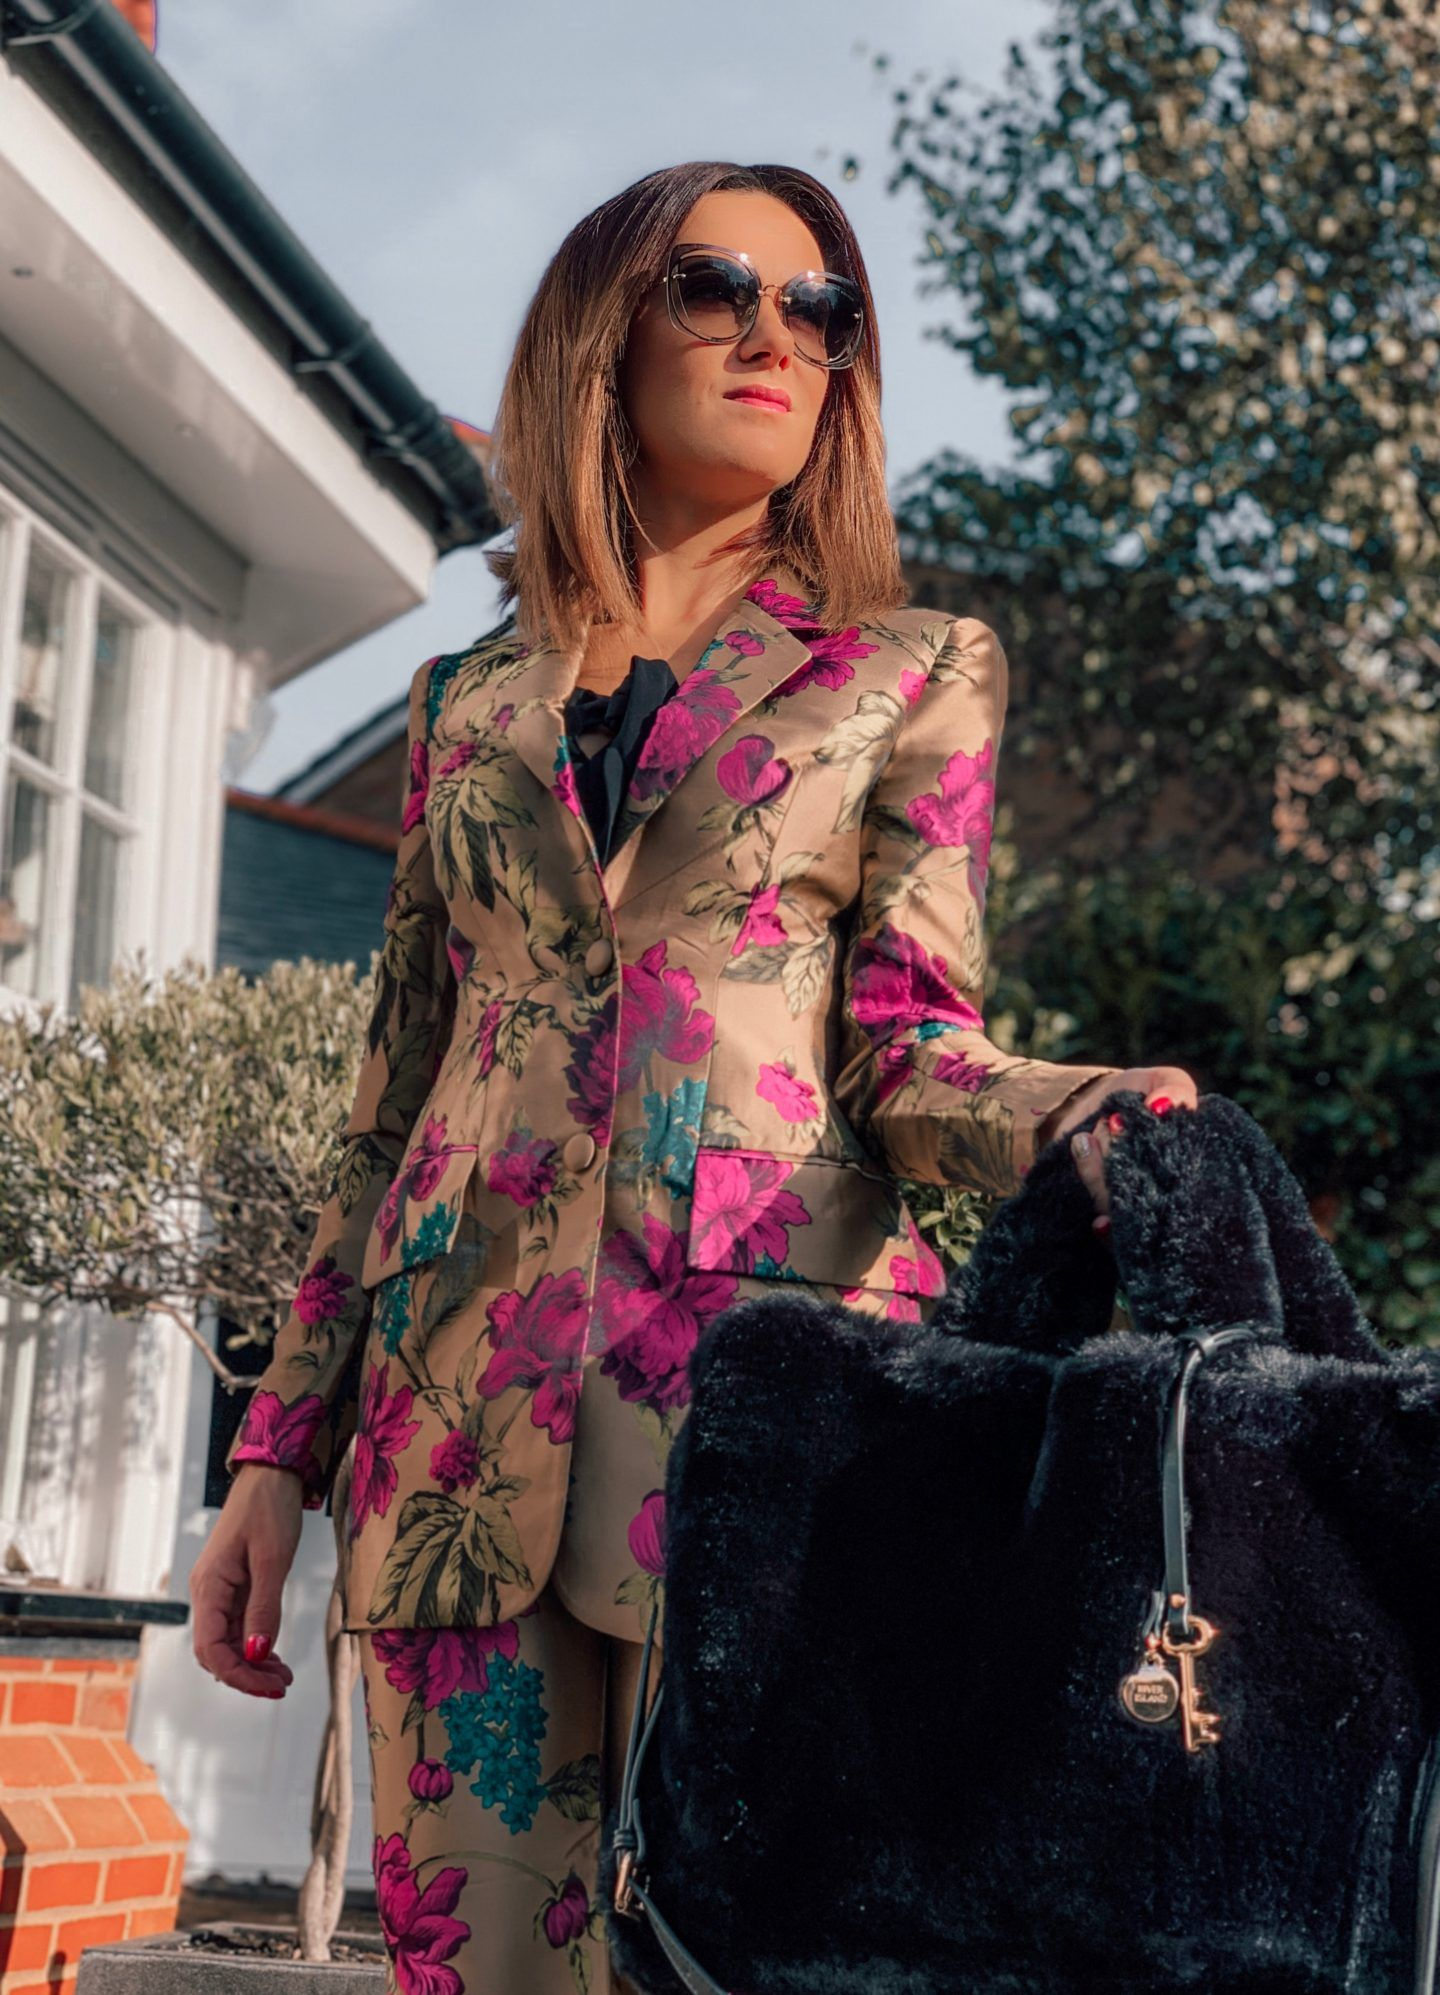 ASOS EDITION floral jacquard blazer | ASOS EDITION floral jacquard trouser | Ted Baker Mesh Insert Court Shoes | River Island oversized fur bag Miu Miu sunglasses